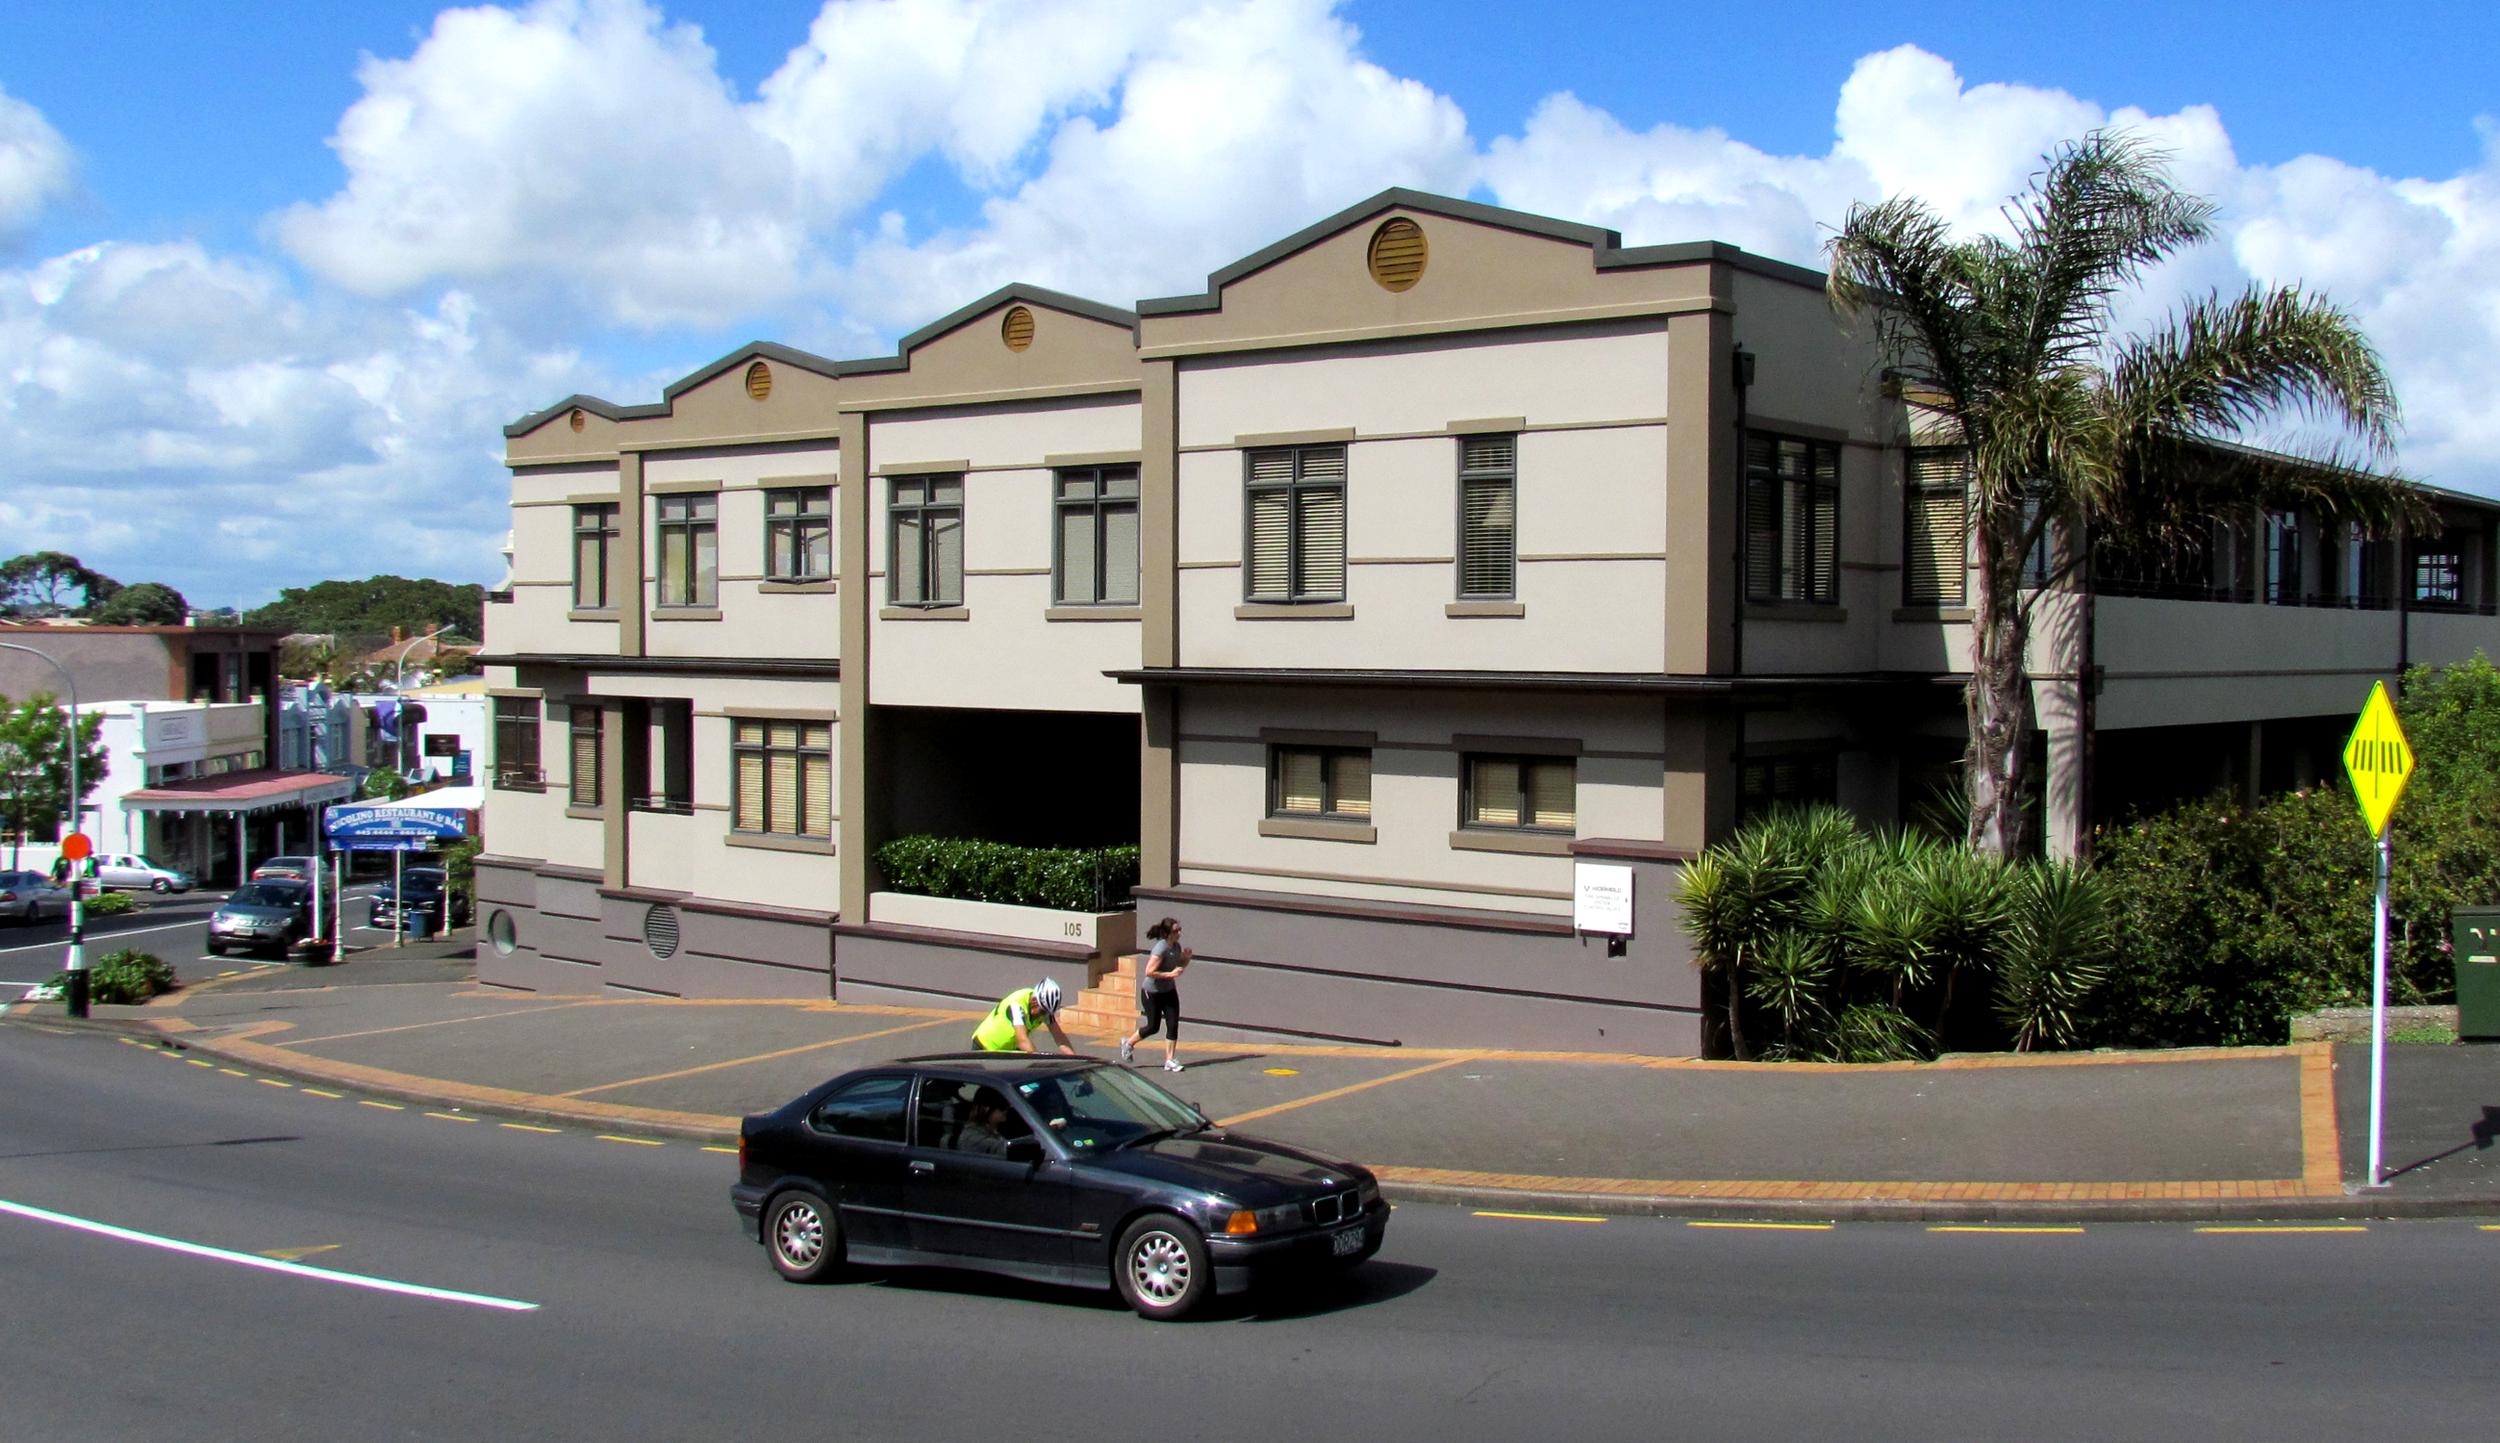 medium density residential-Victoria Rd, Devonport -apartments-2 ed.png